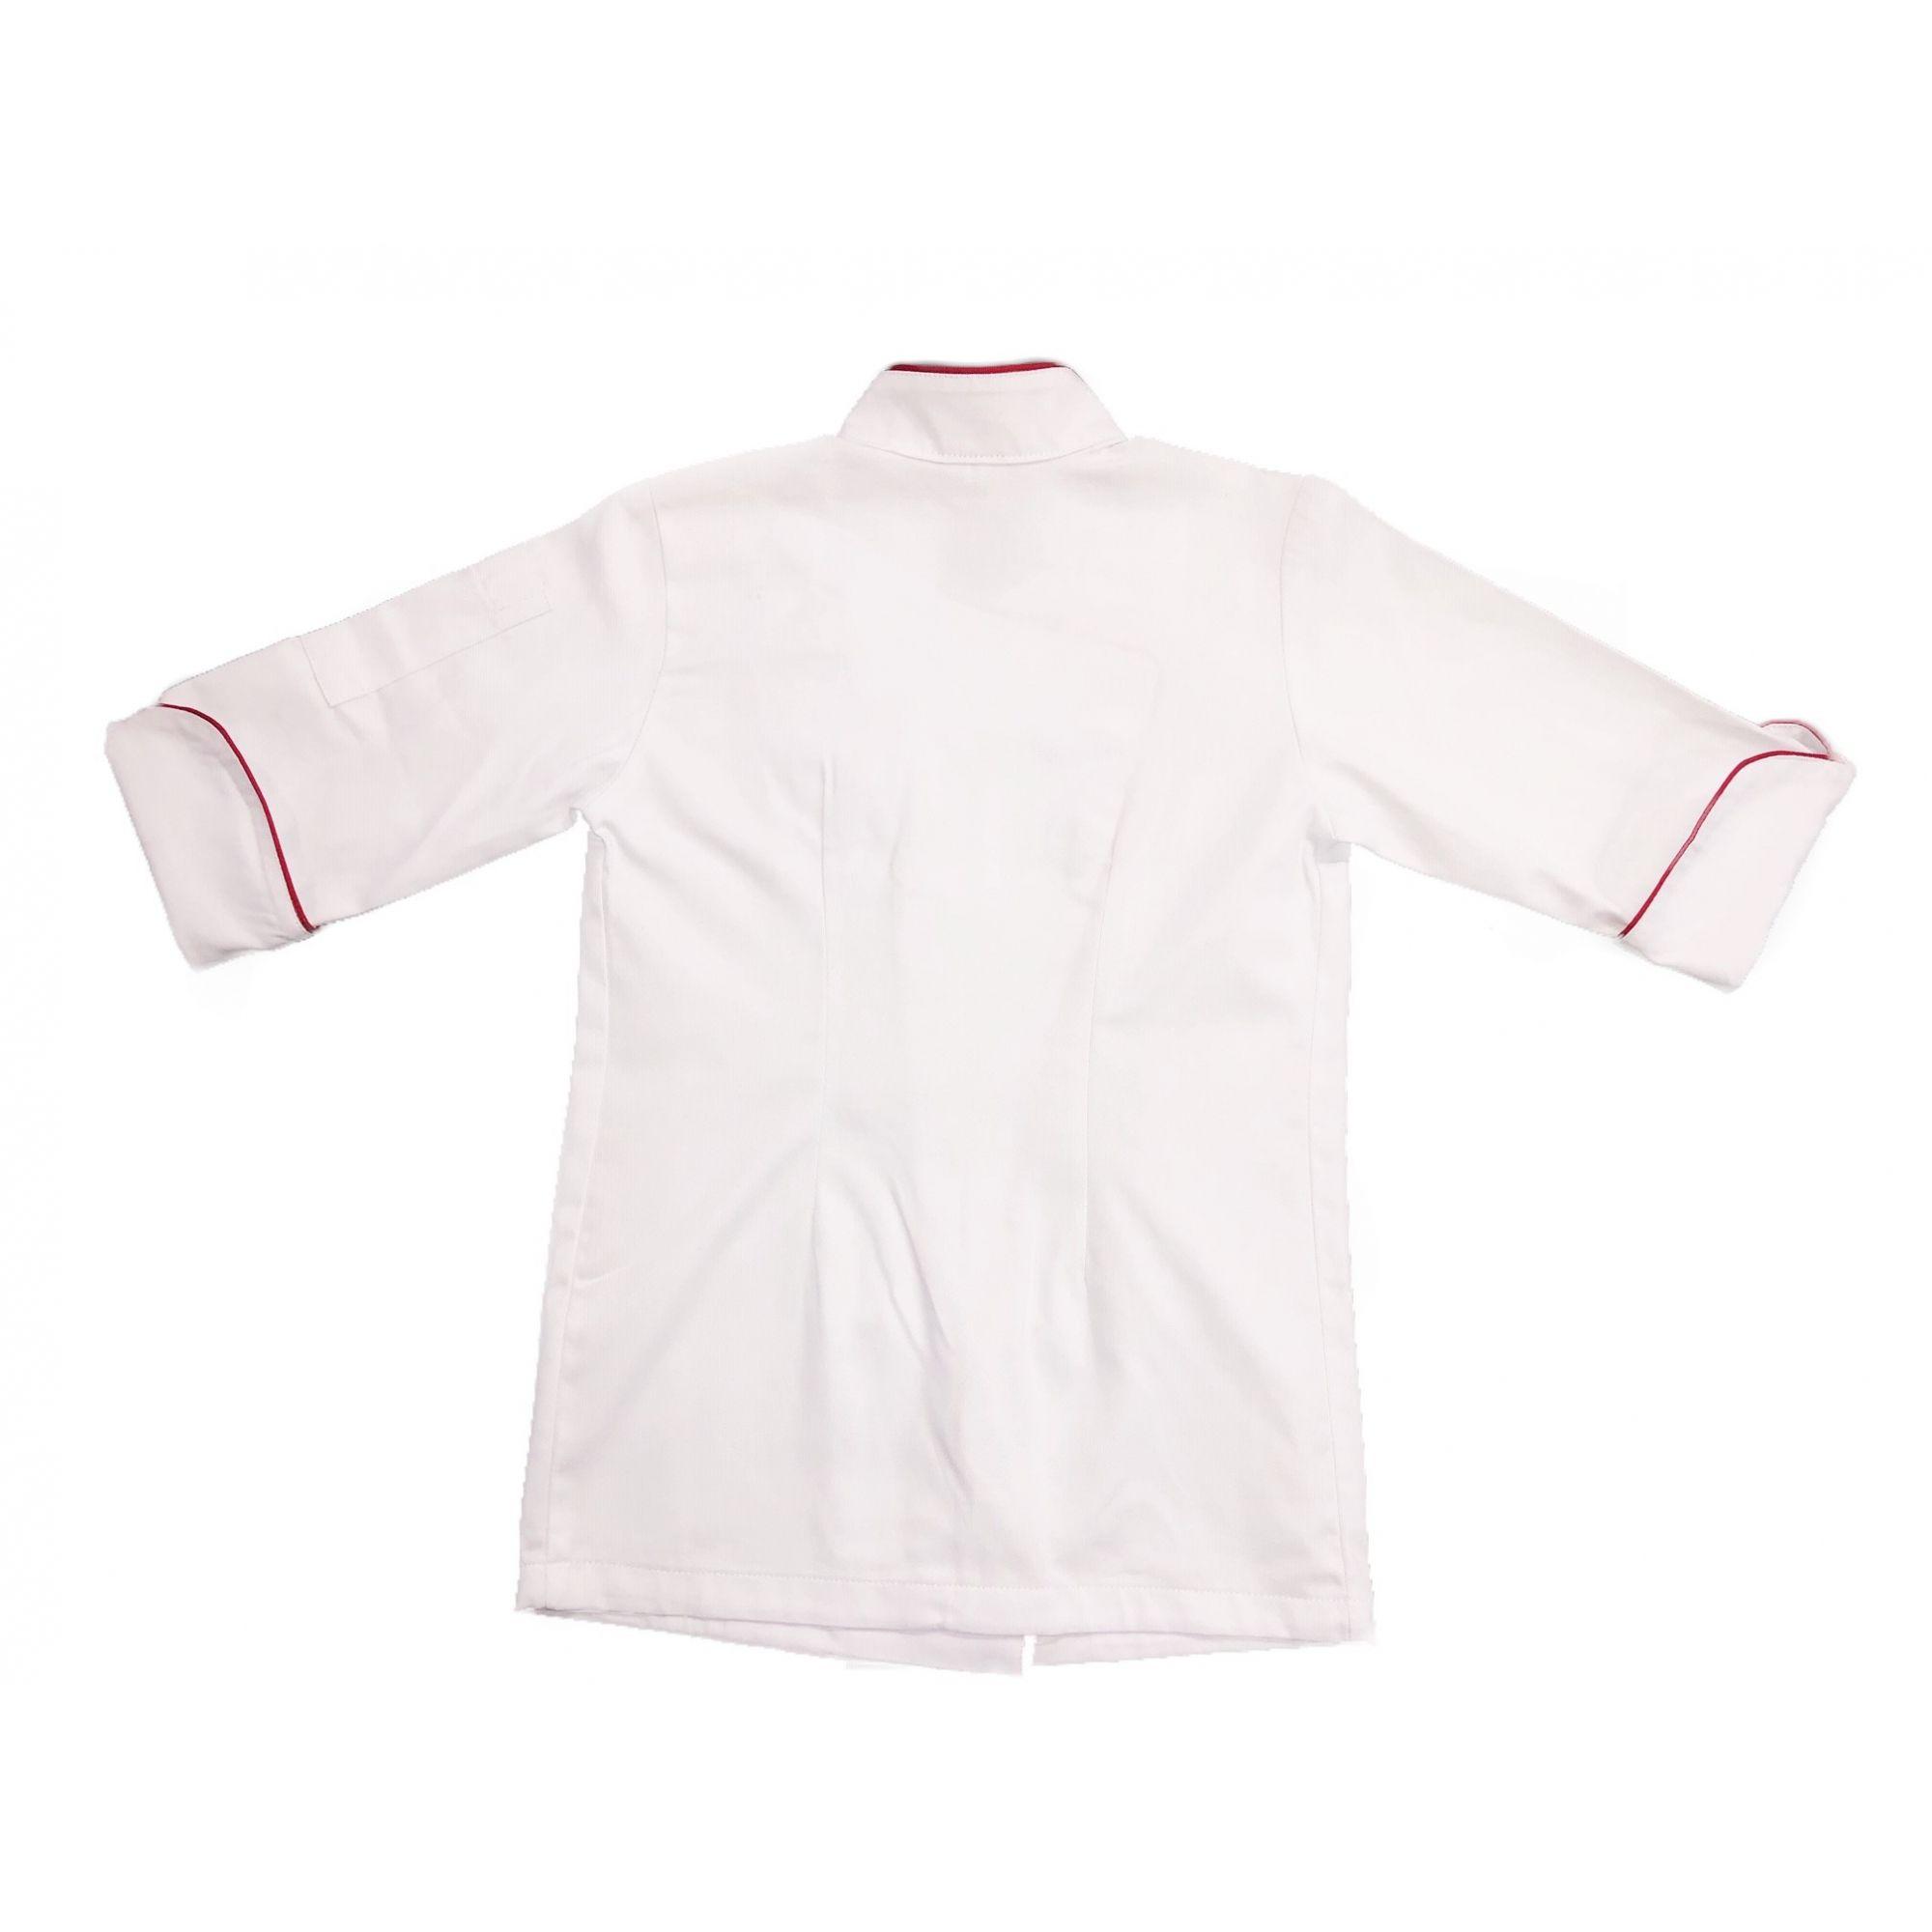 Conjunto Dólmã MINI CHEF Clássica  Unisex Branca Botões Vivo Vermelho + Avental Mini Preto  100% Algodão Manga 3/4